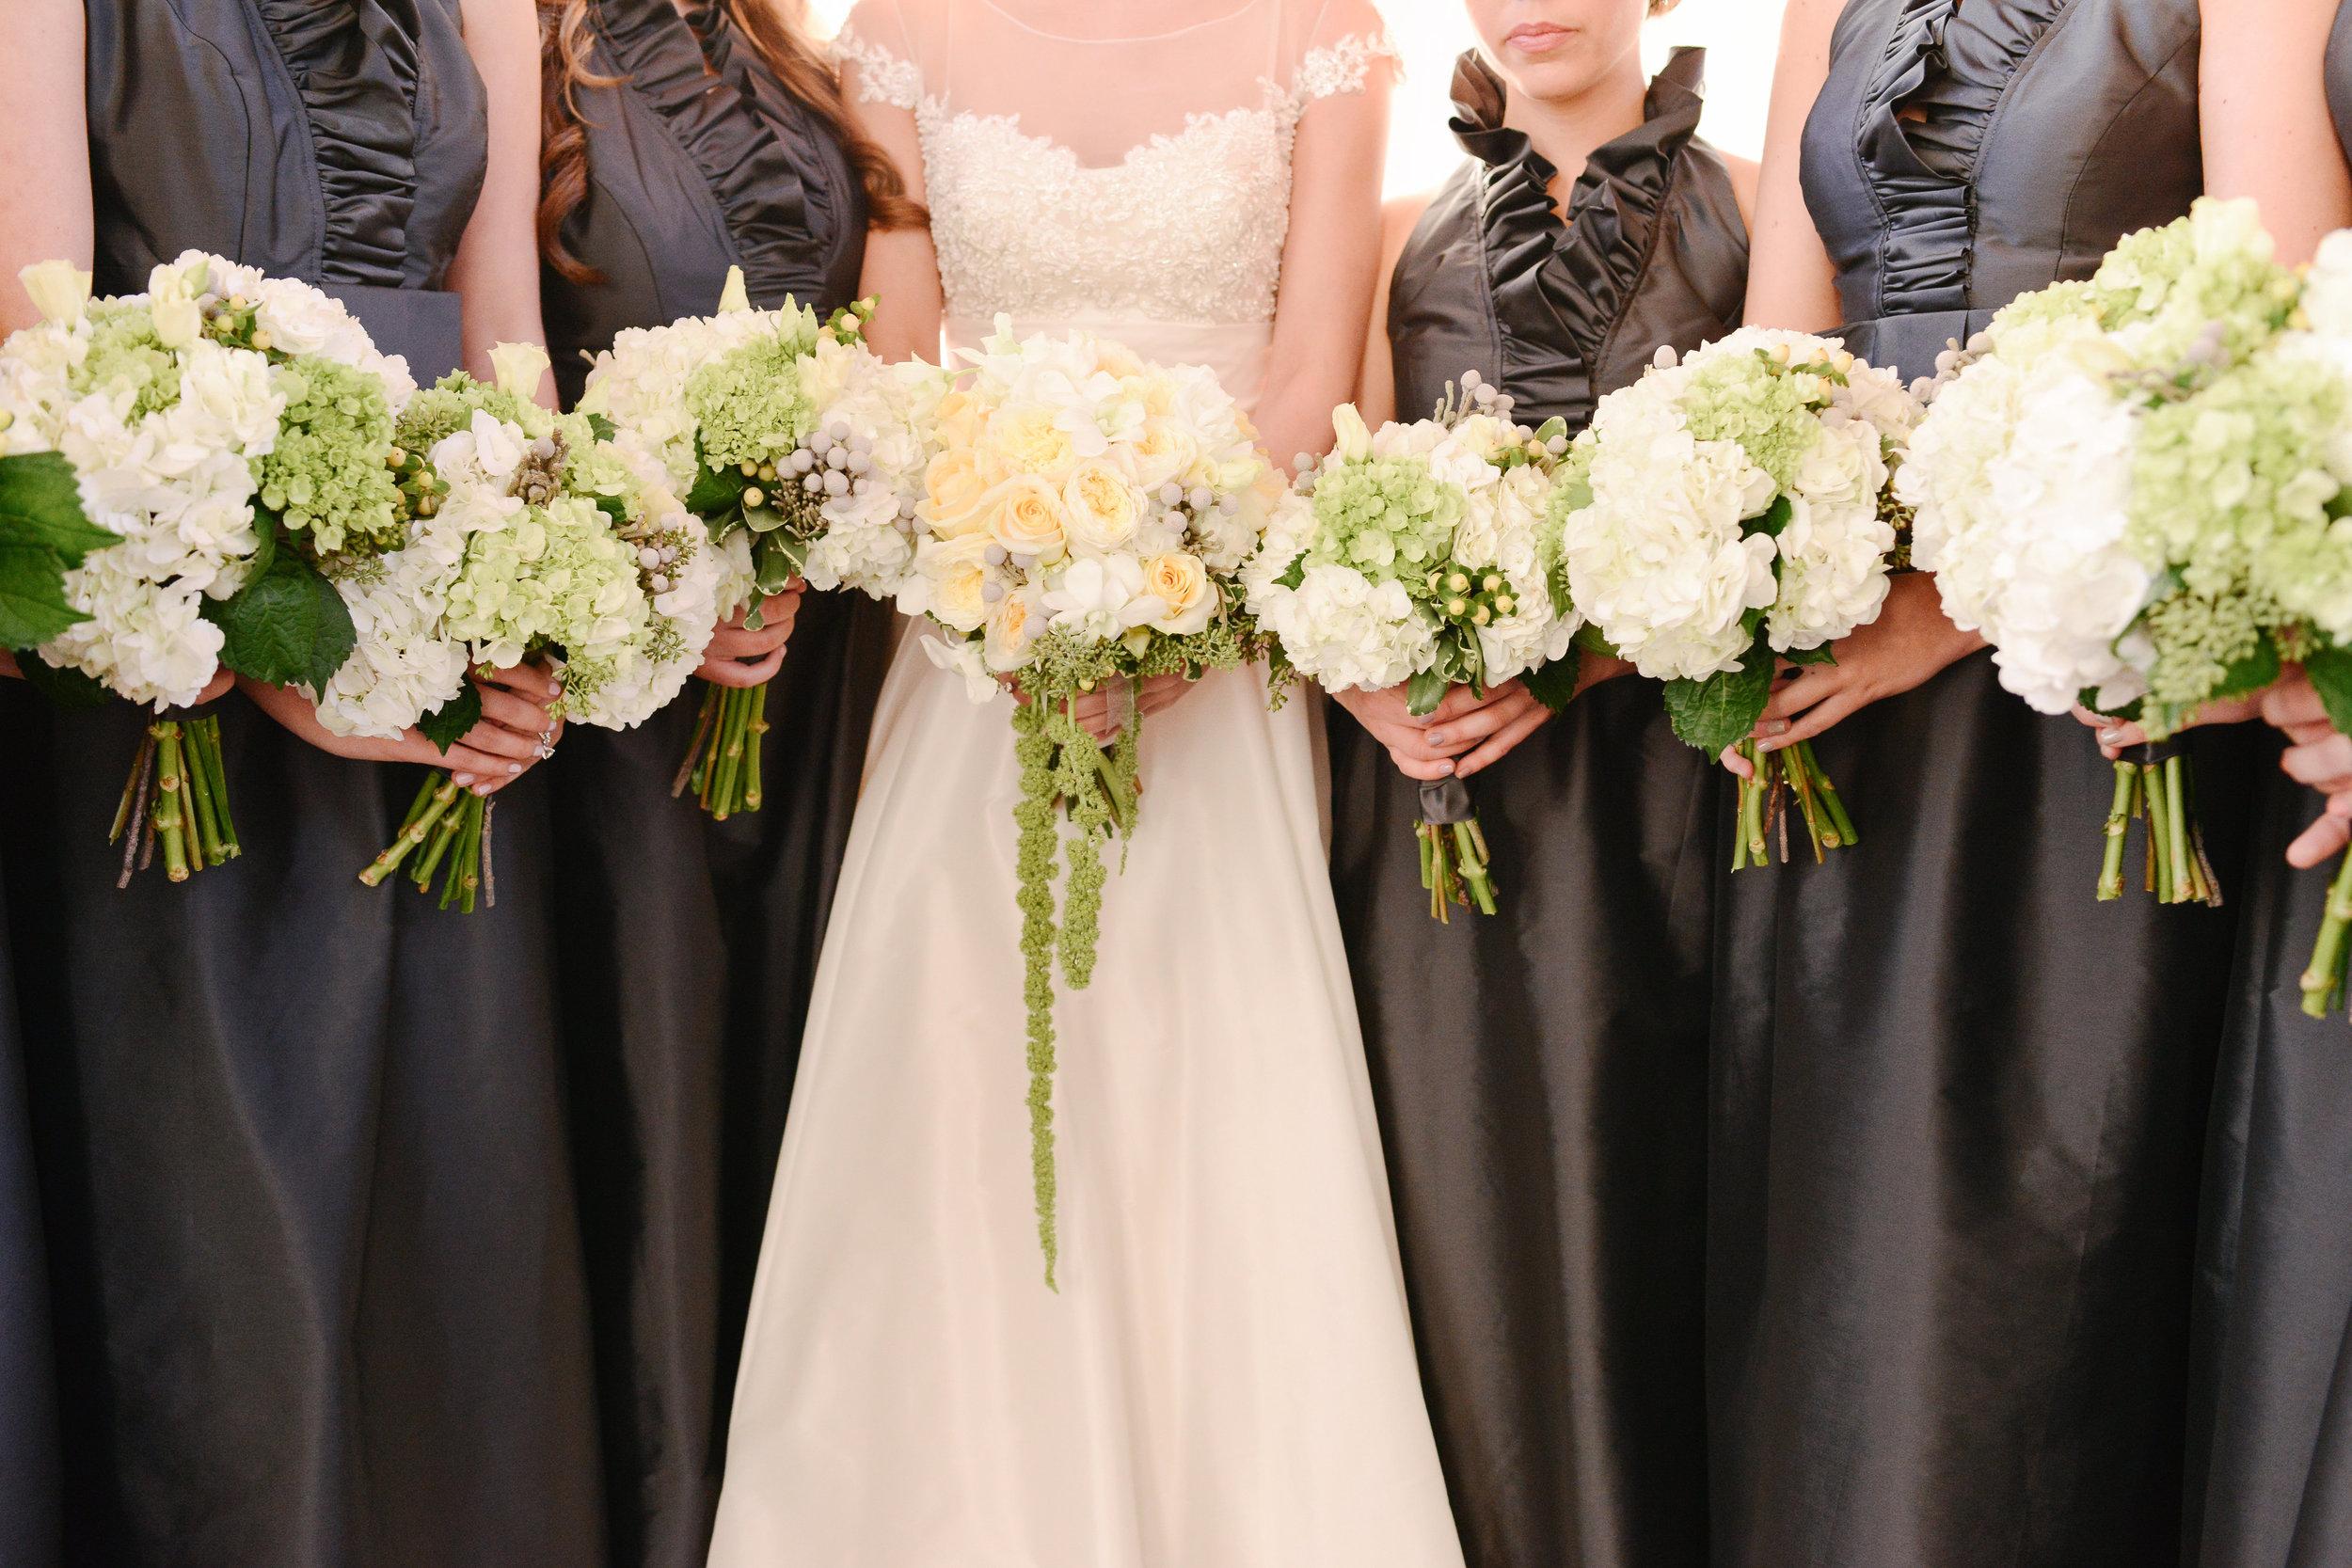 sarah-and-justin-smith-wedding-0162.jpg